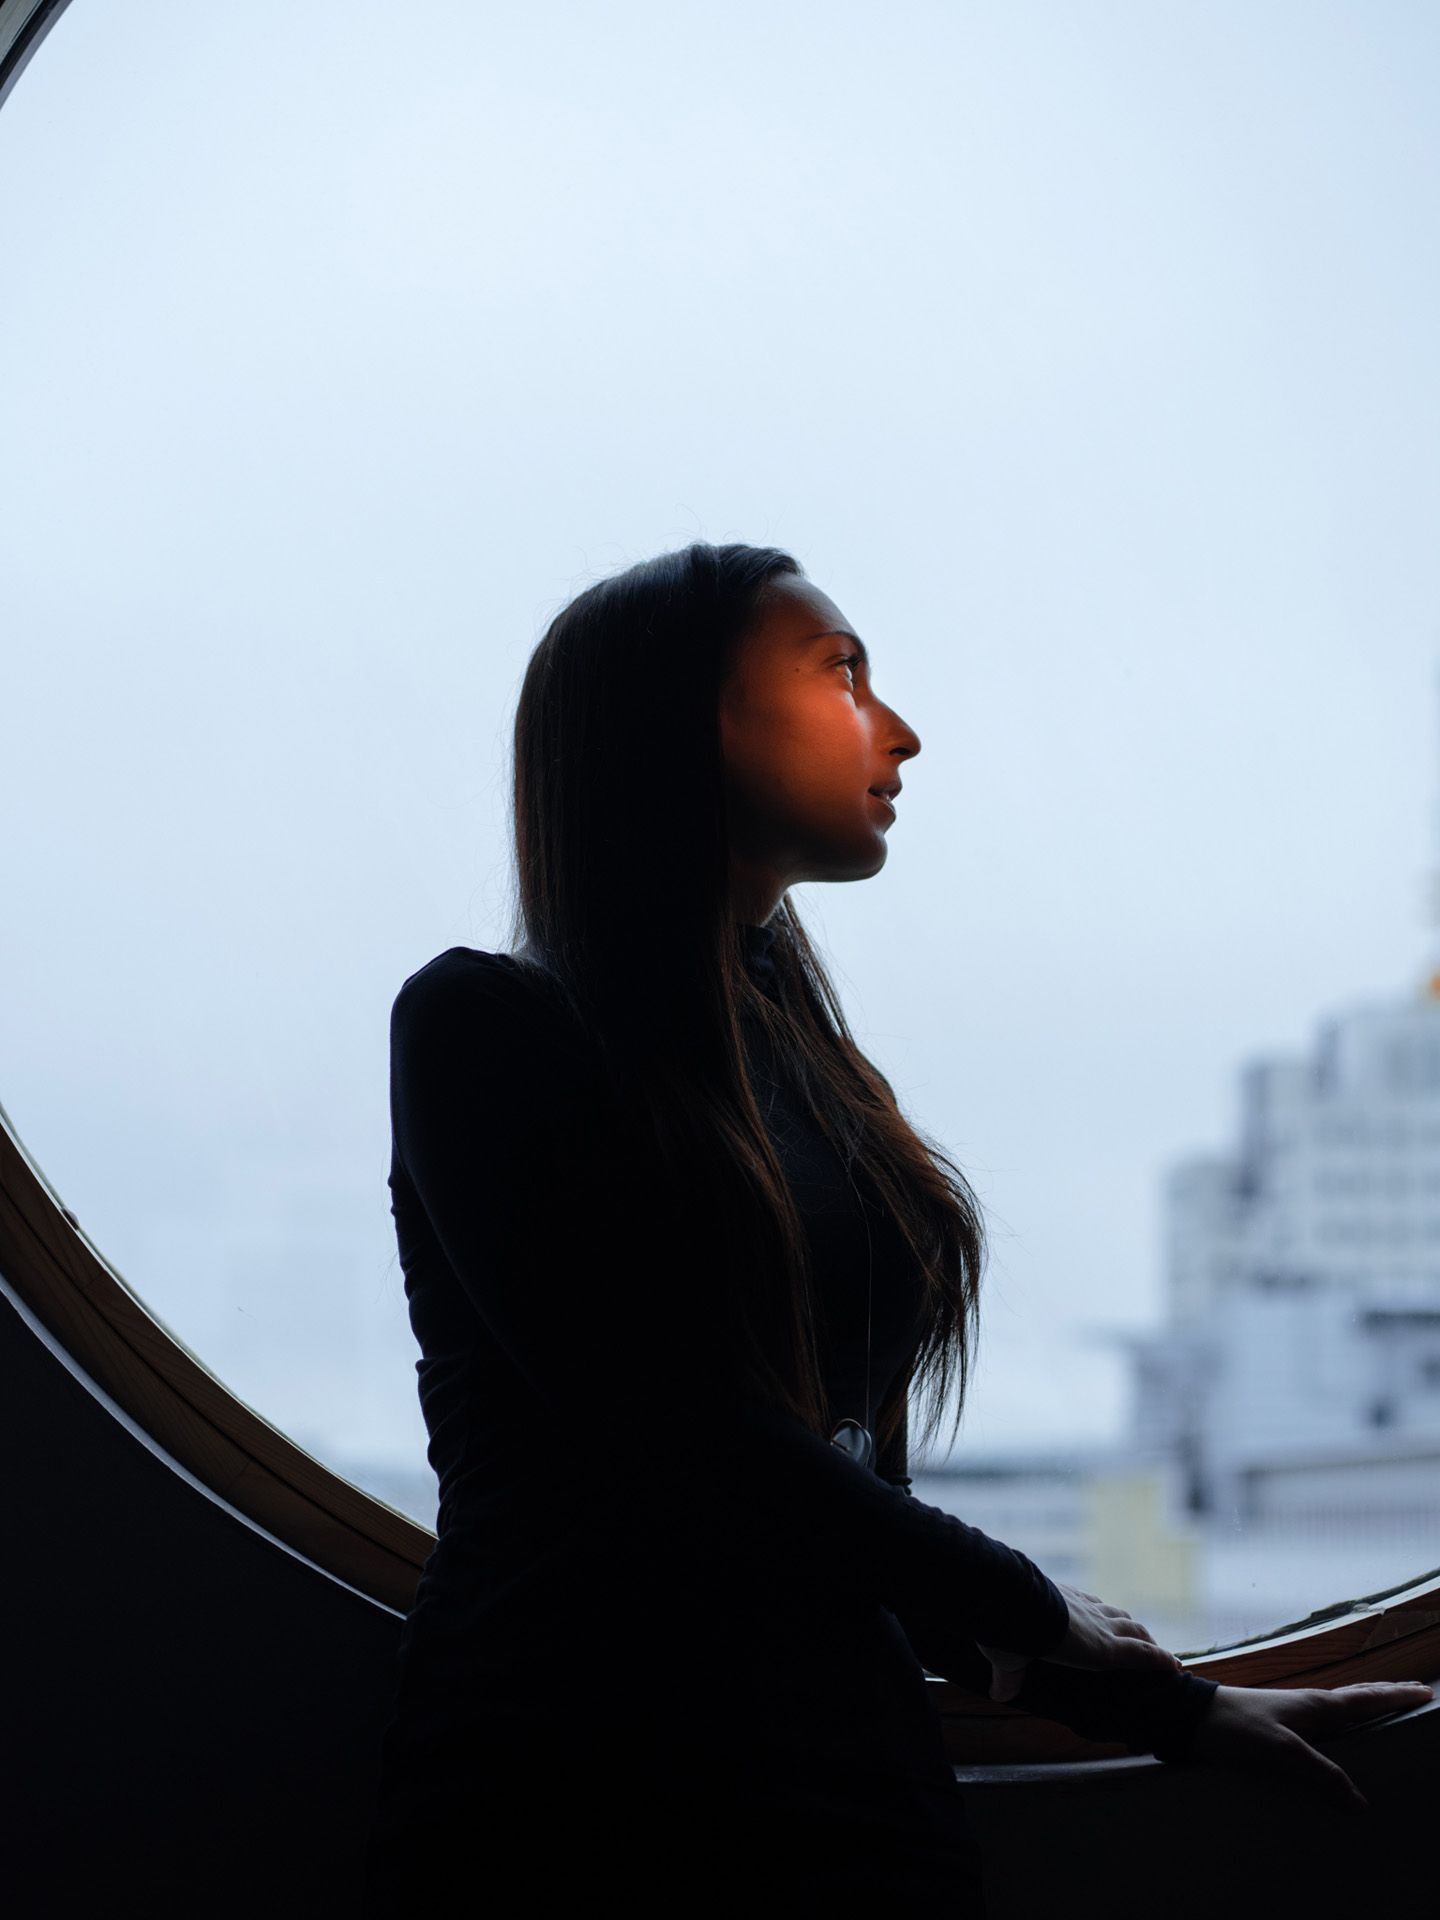 portrait of woman sitting on round window under orange light by Alexi Hobbs for WSP